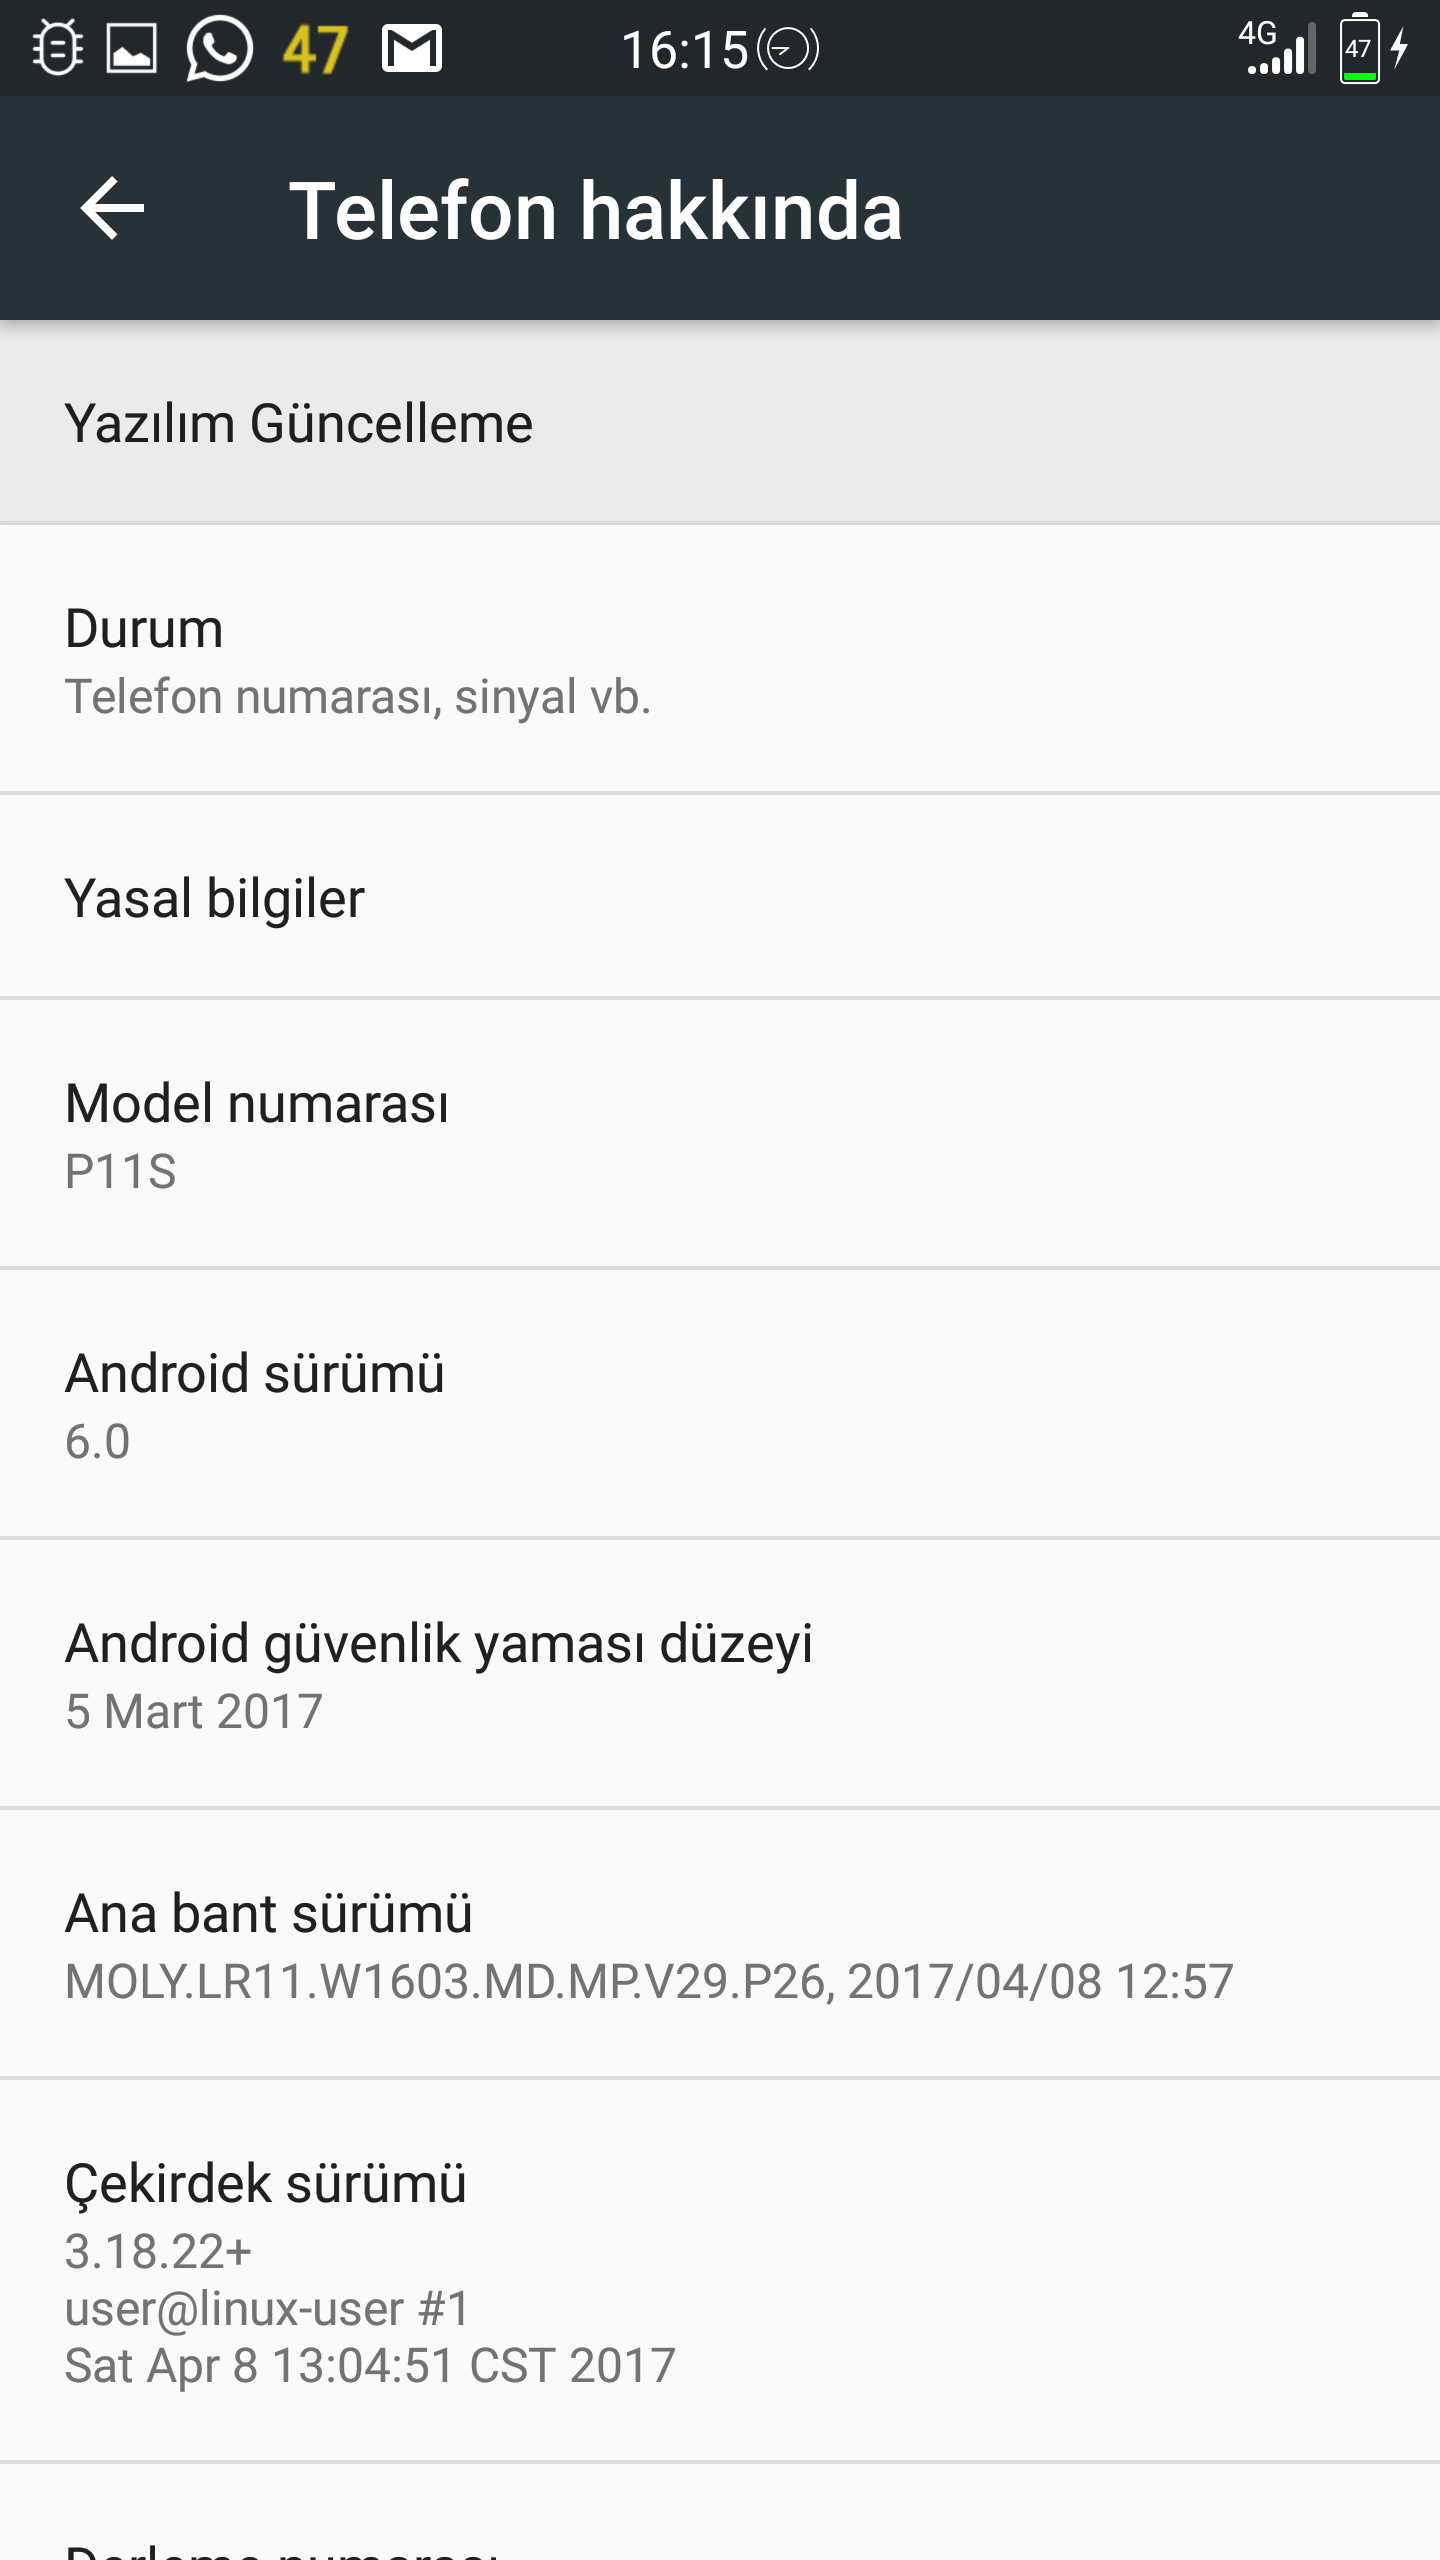 Screenshot_20170424-161546.png